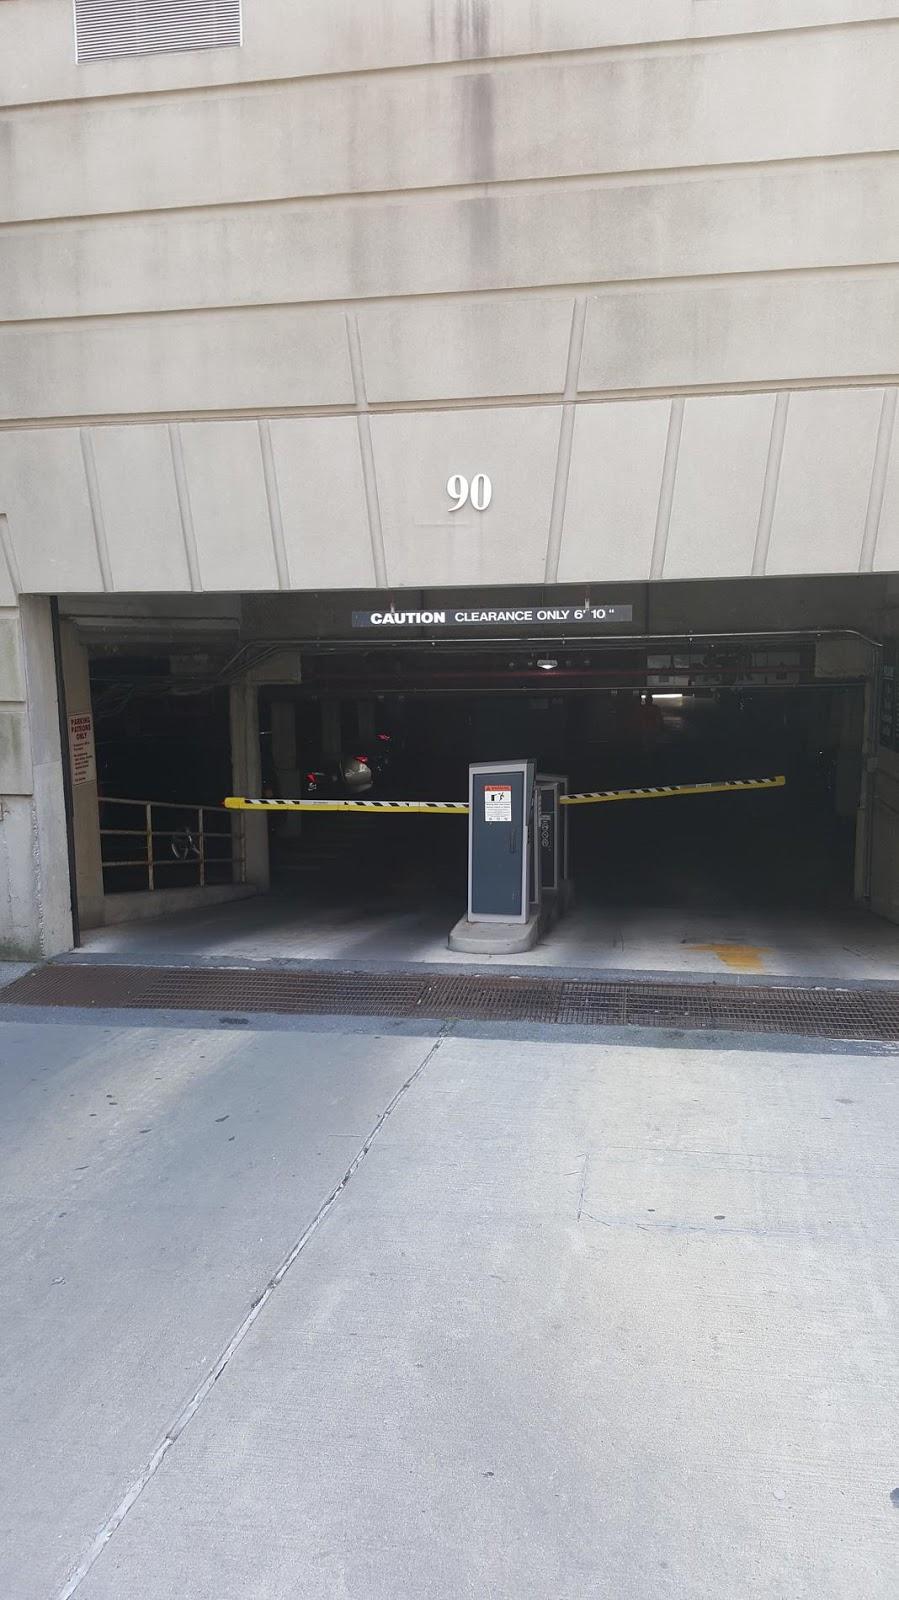 SP+ Parking - parking    Photo 2 of 4   Address: 90 Oceana Dr W, Brooklyn, NY 11235, USA   Phone: (212) 321-7500